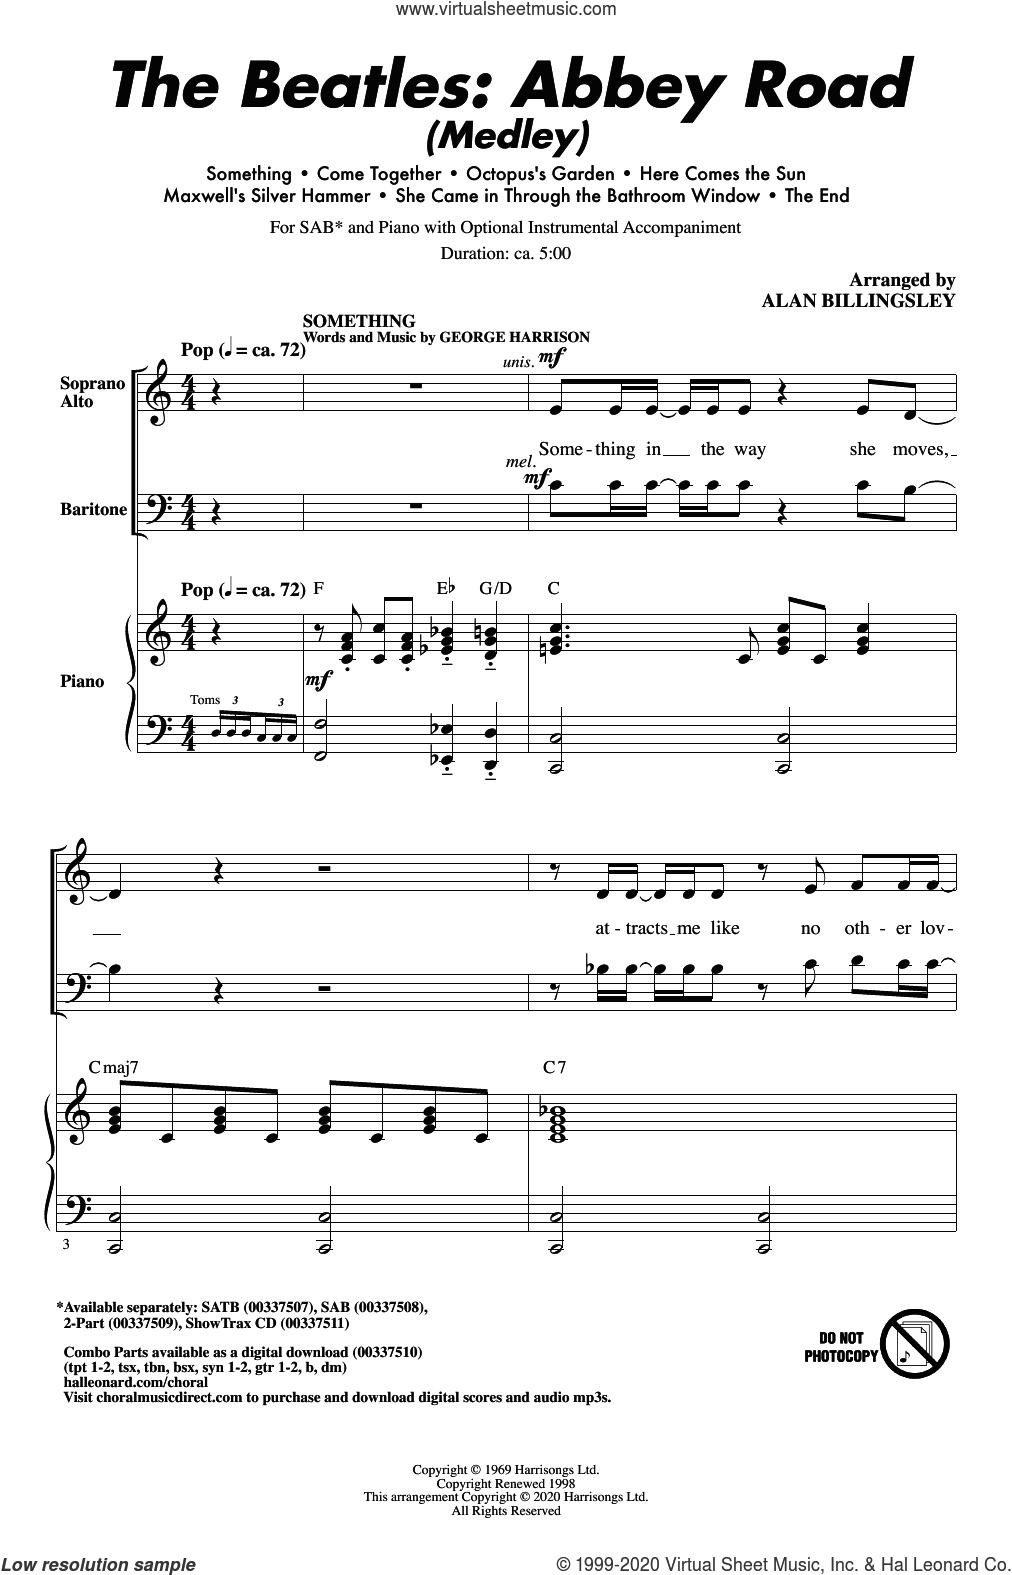 The Beatles: Abbey Road (Medley) (arr. Alan Billingsley) sheet music for choir (SAB: soprano, alto, bass) by The Beatles, Alan Billingsley, John Lennon and Paul McCartney, intermediate skill level